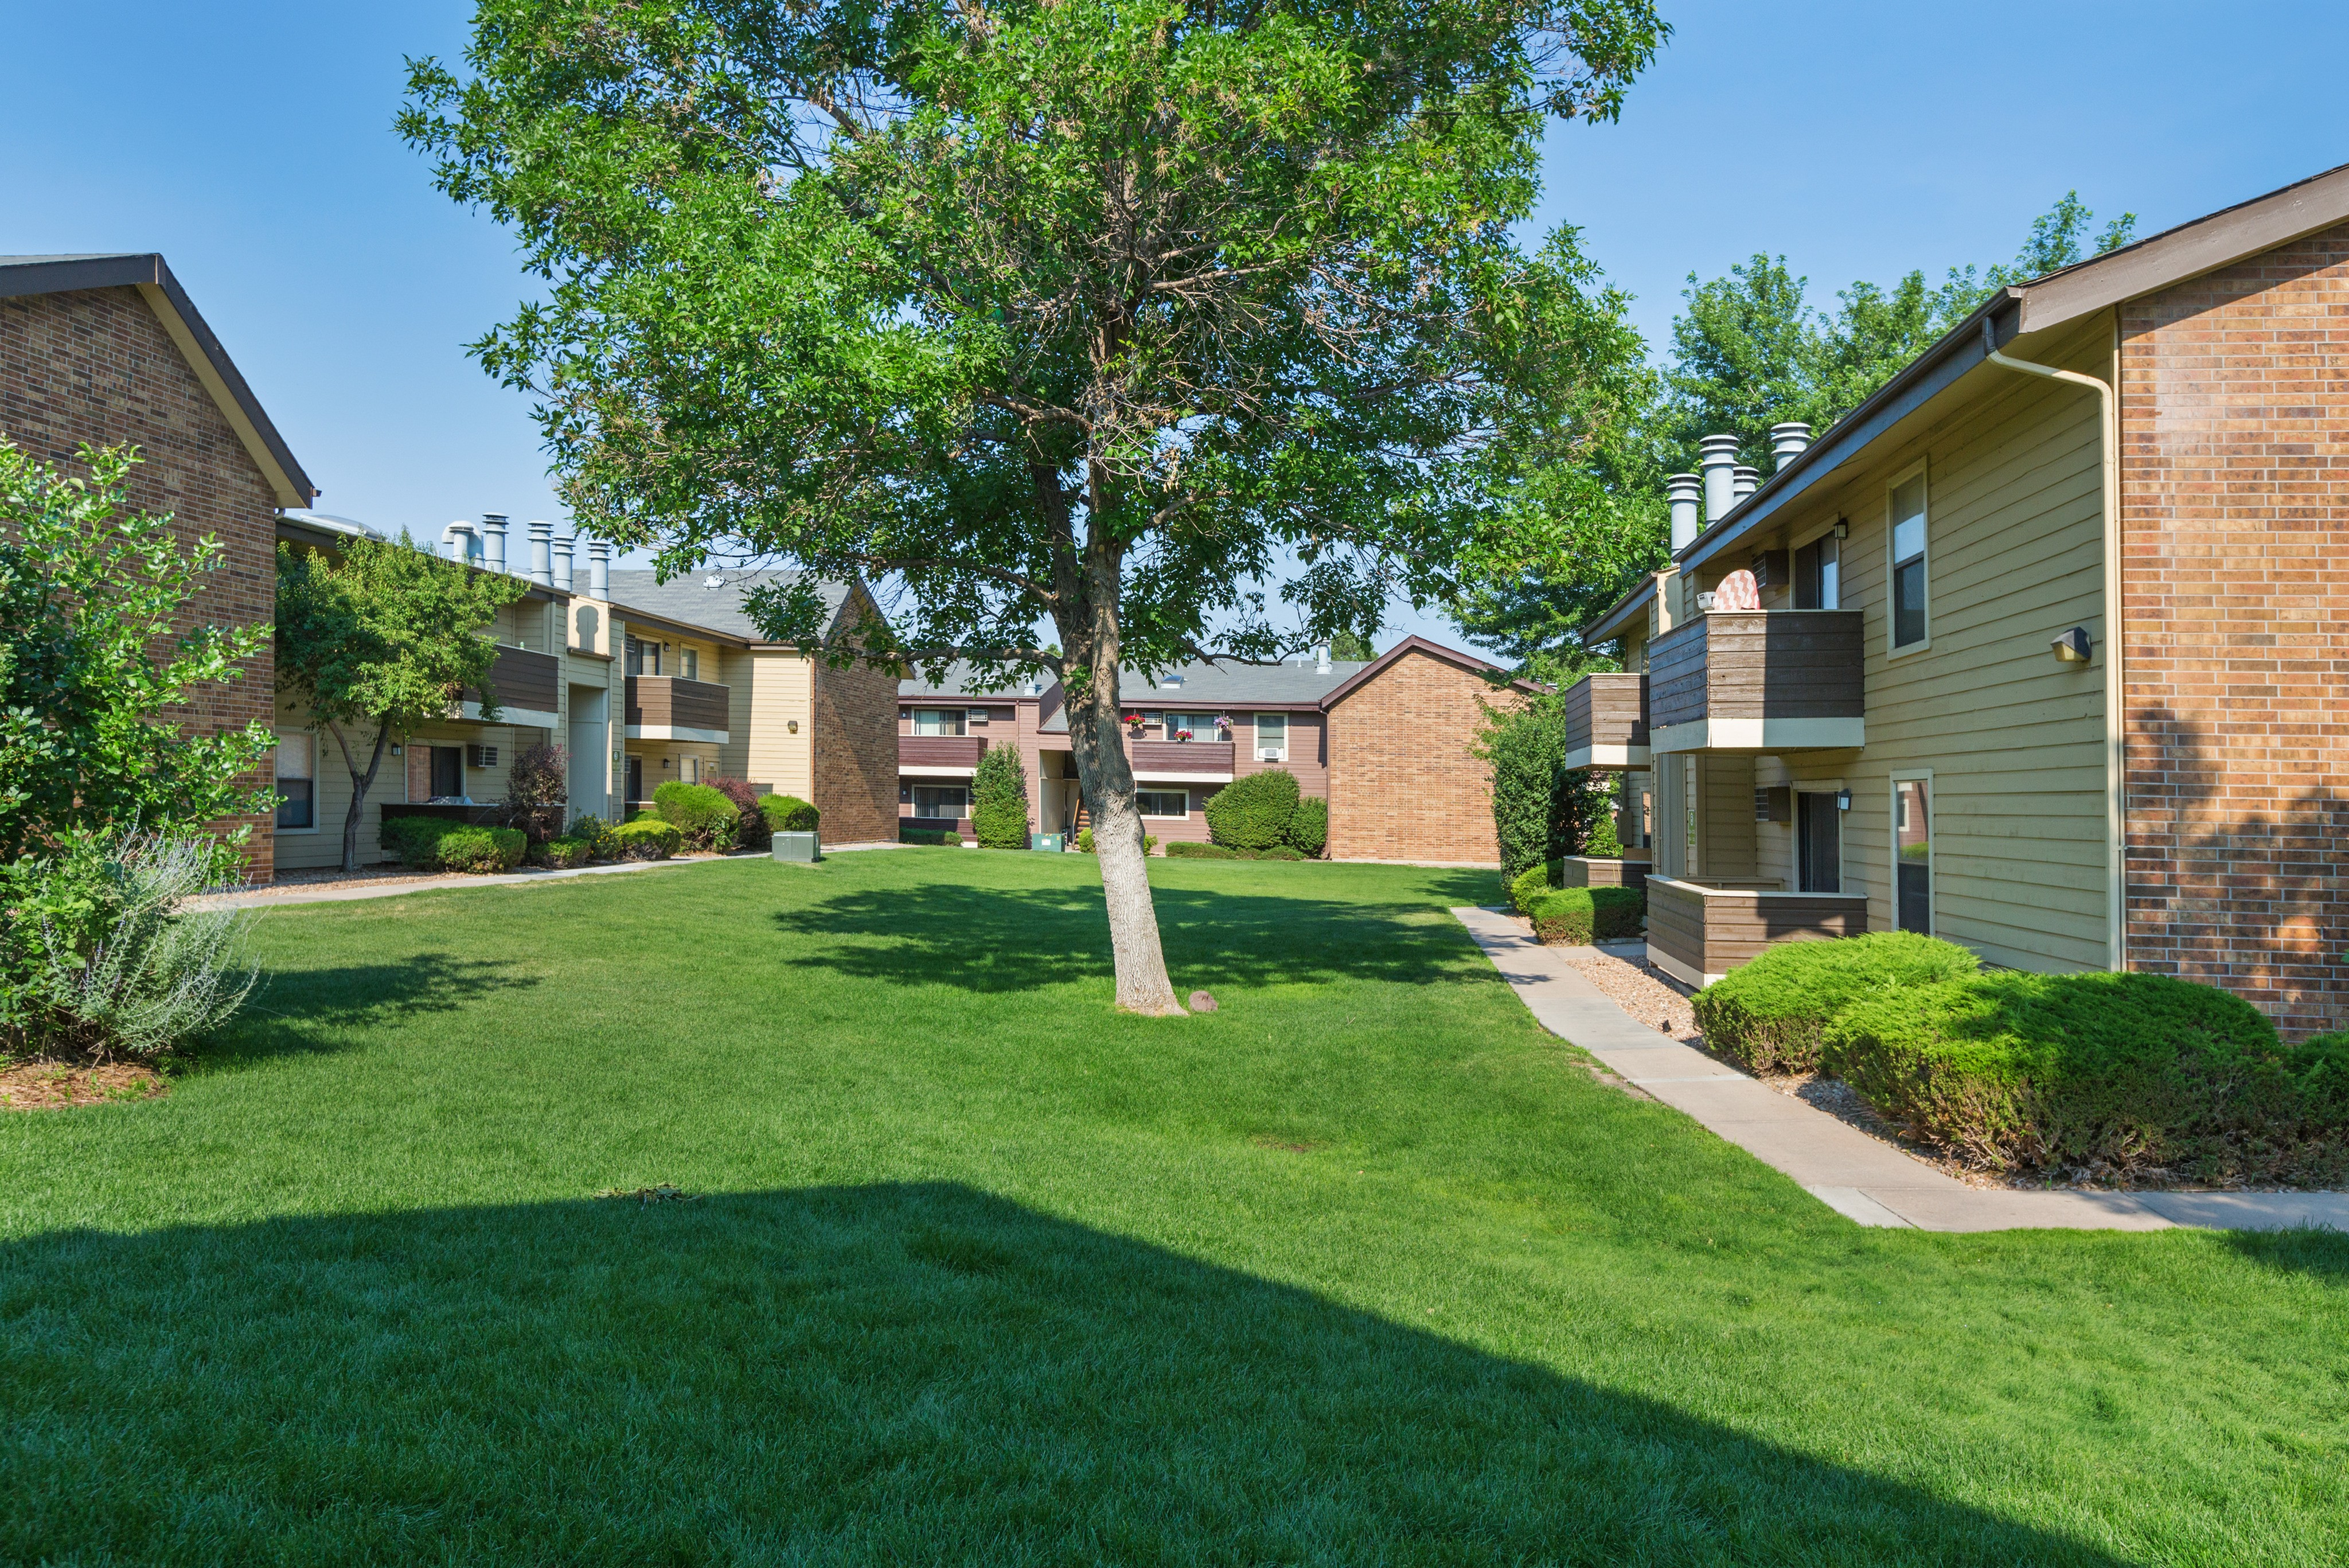 Torrey Pines Apartments rental